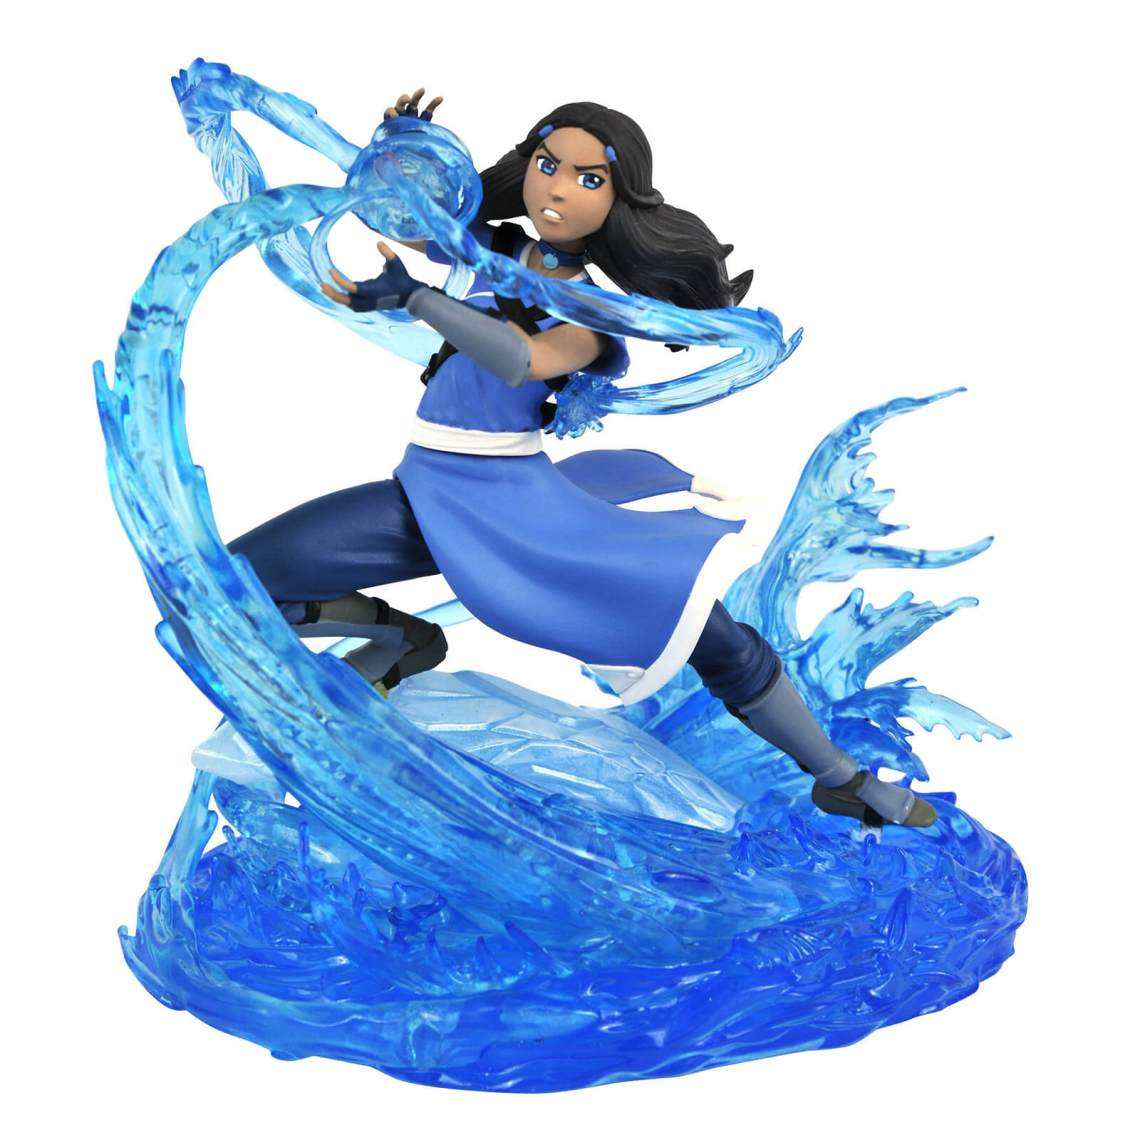 Diamond Select Avatar: The Last Airbender Gallery PVC Figure - Katara